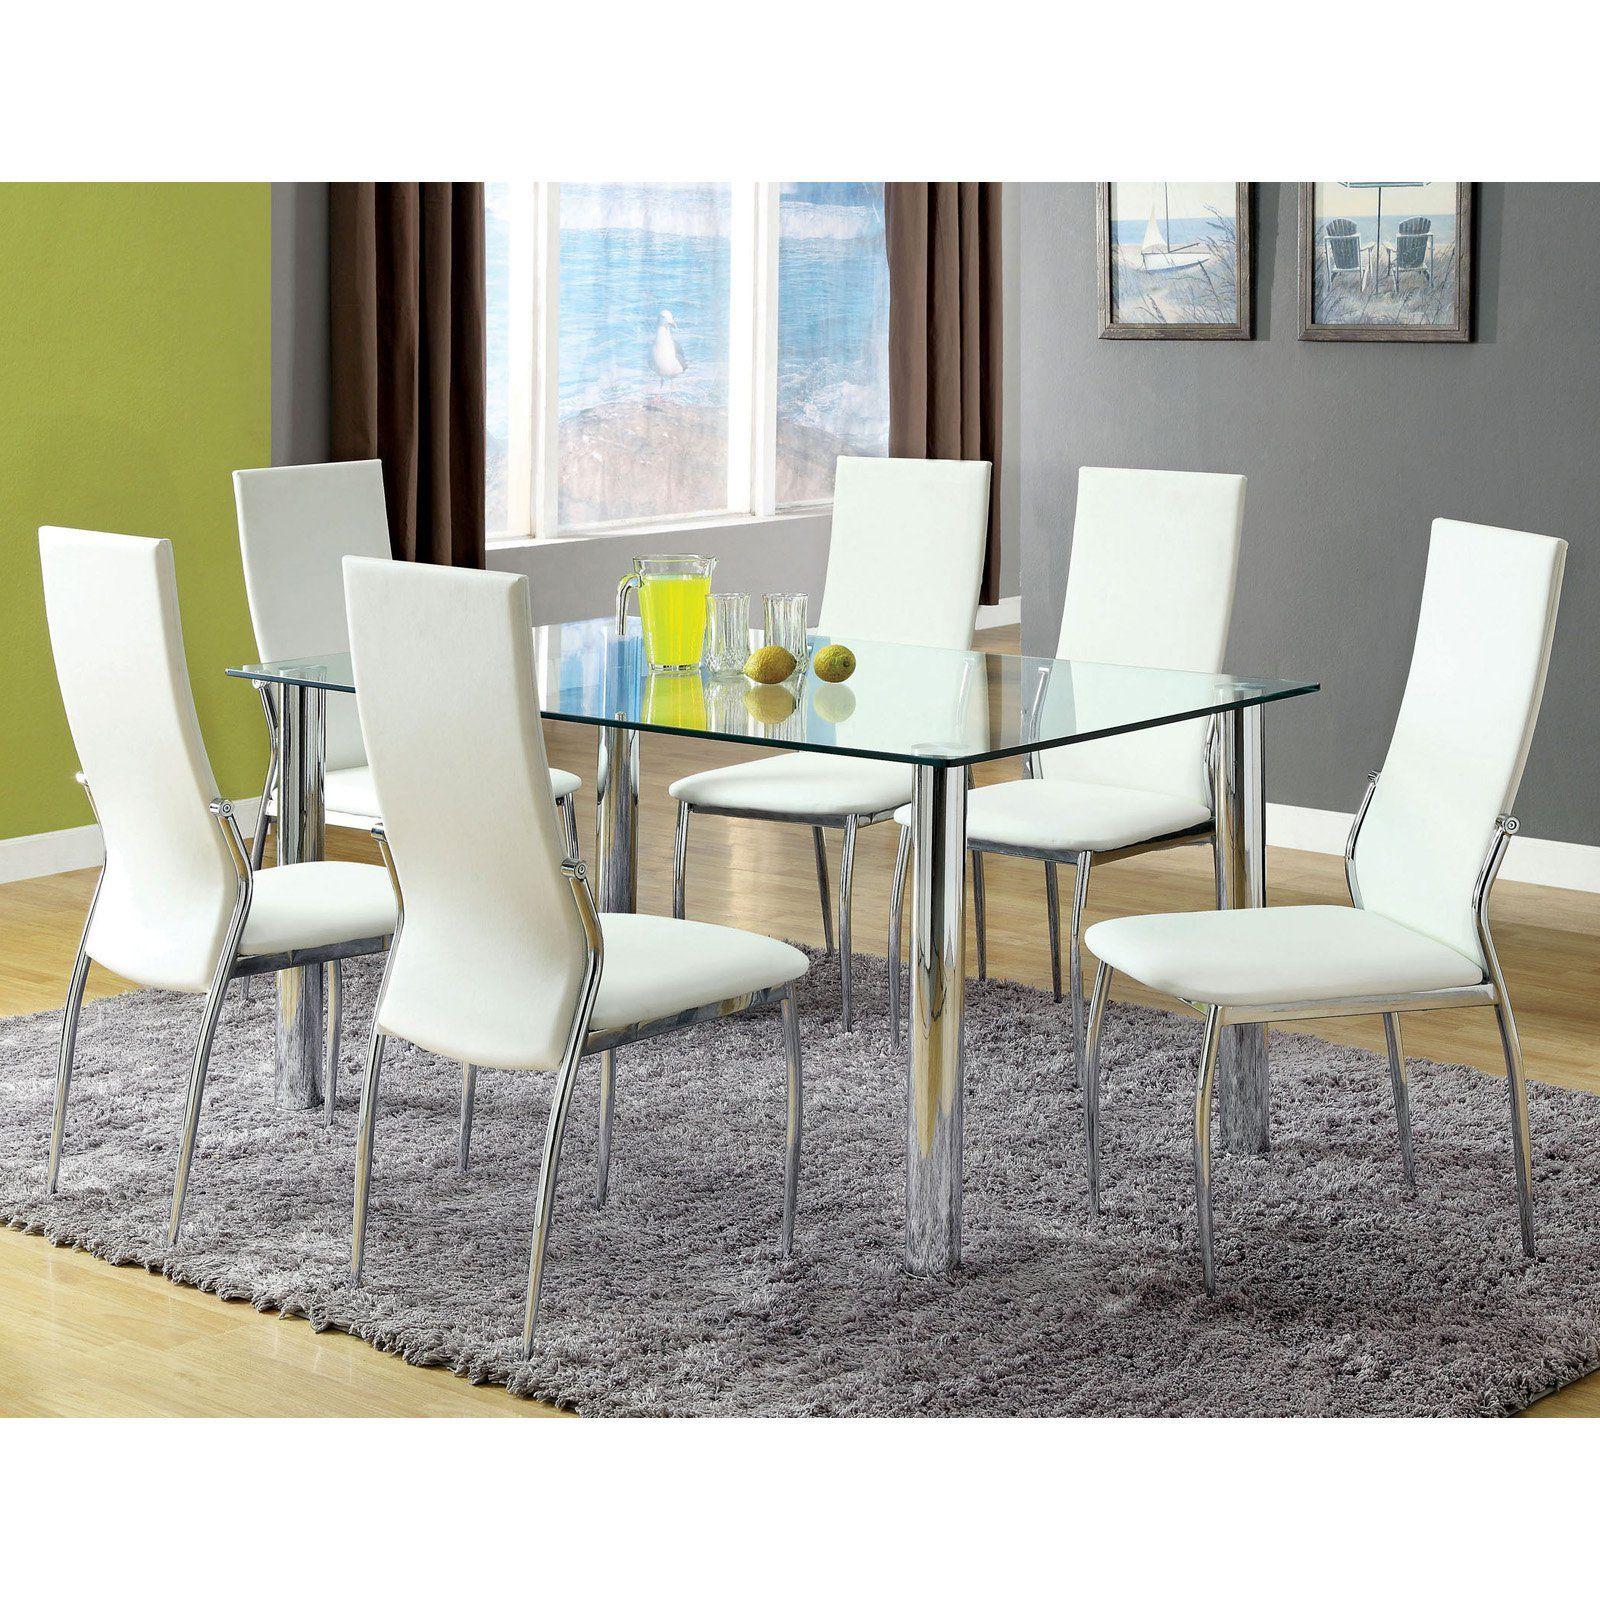 Room · Furniture Of America Zeino 7 Piece Glass Top Dining ...